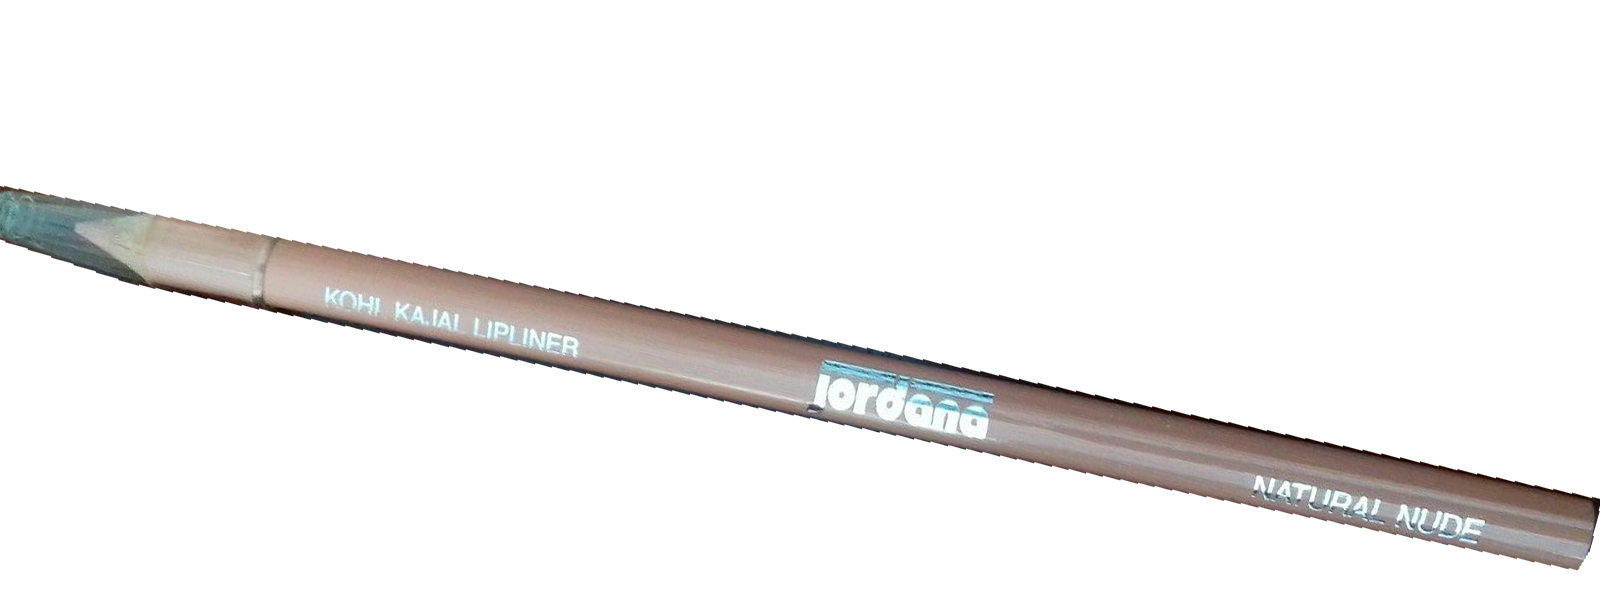 "Jordana Kohl Kajal 7"" Long Lipliner - Natural Nude"